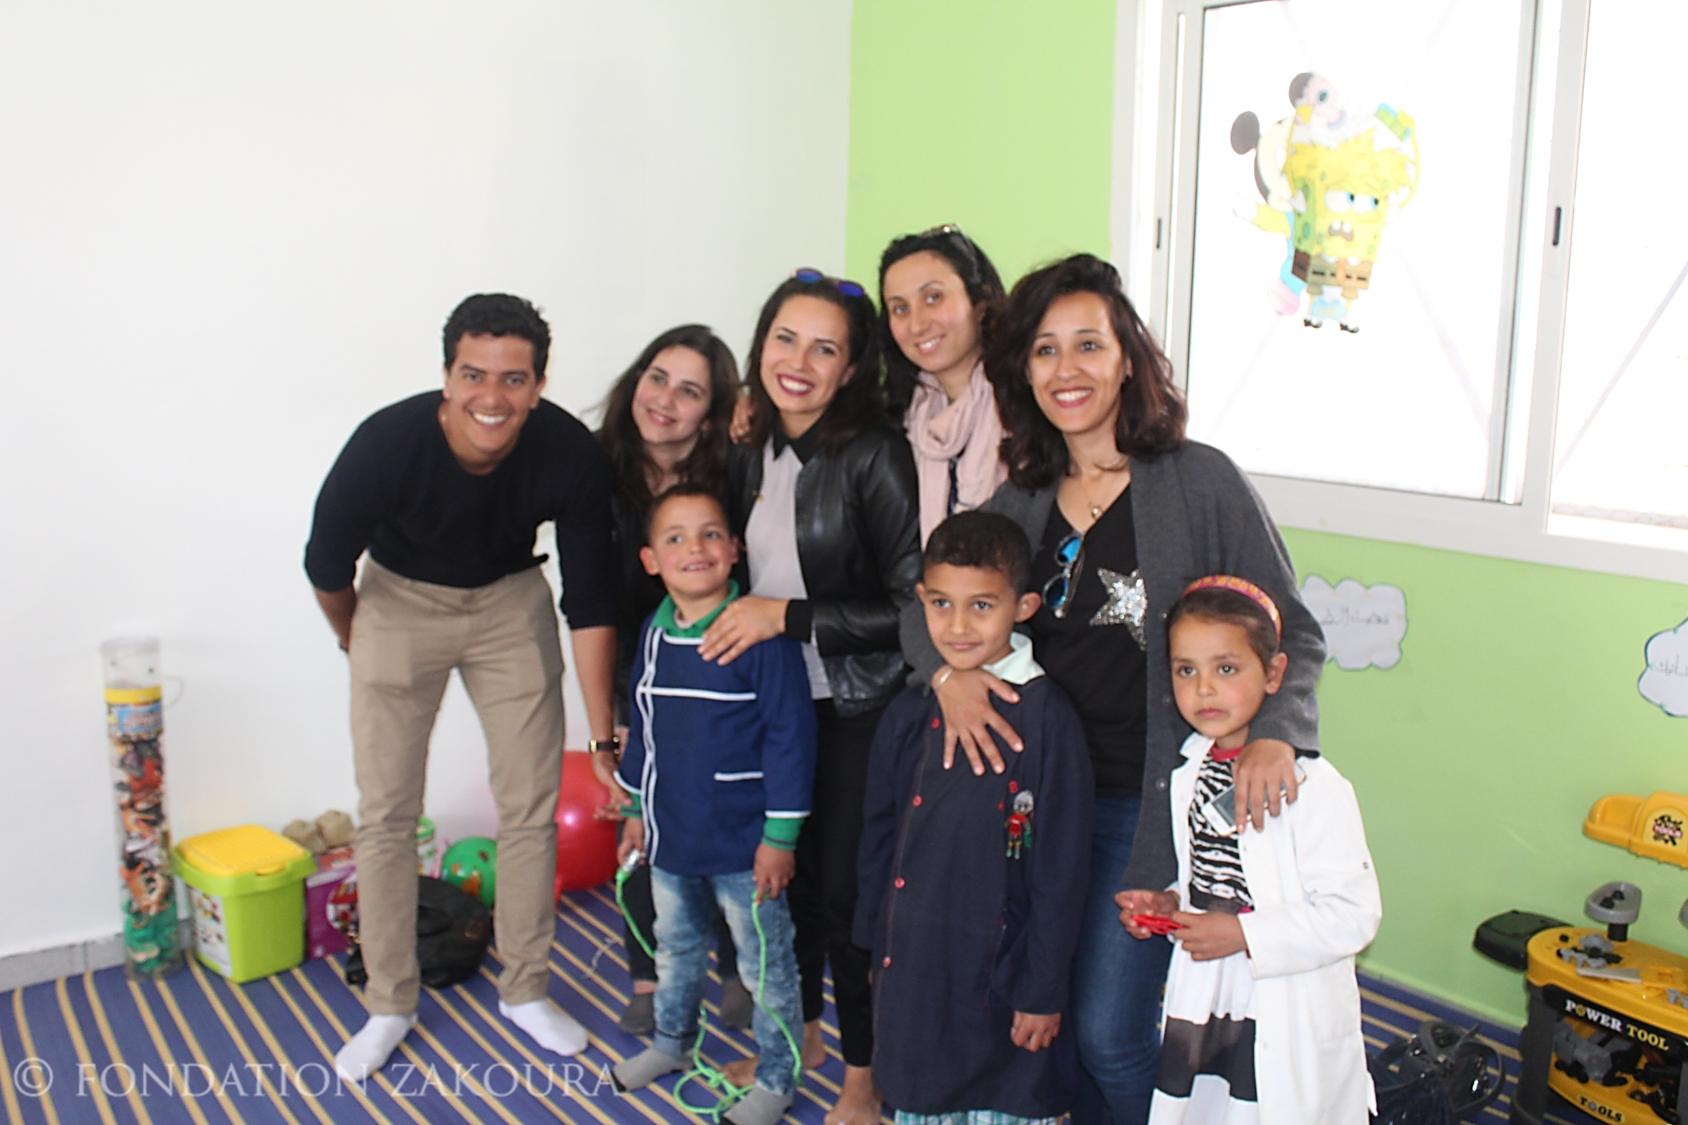 Un Community Initiative Award pour la campagne #PreschoolHeroes !